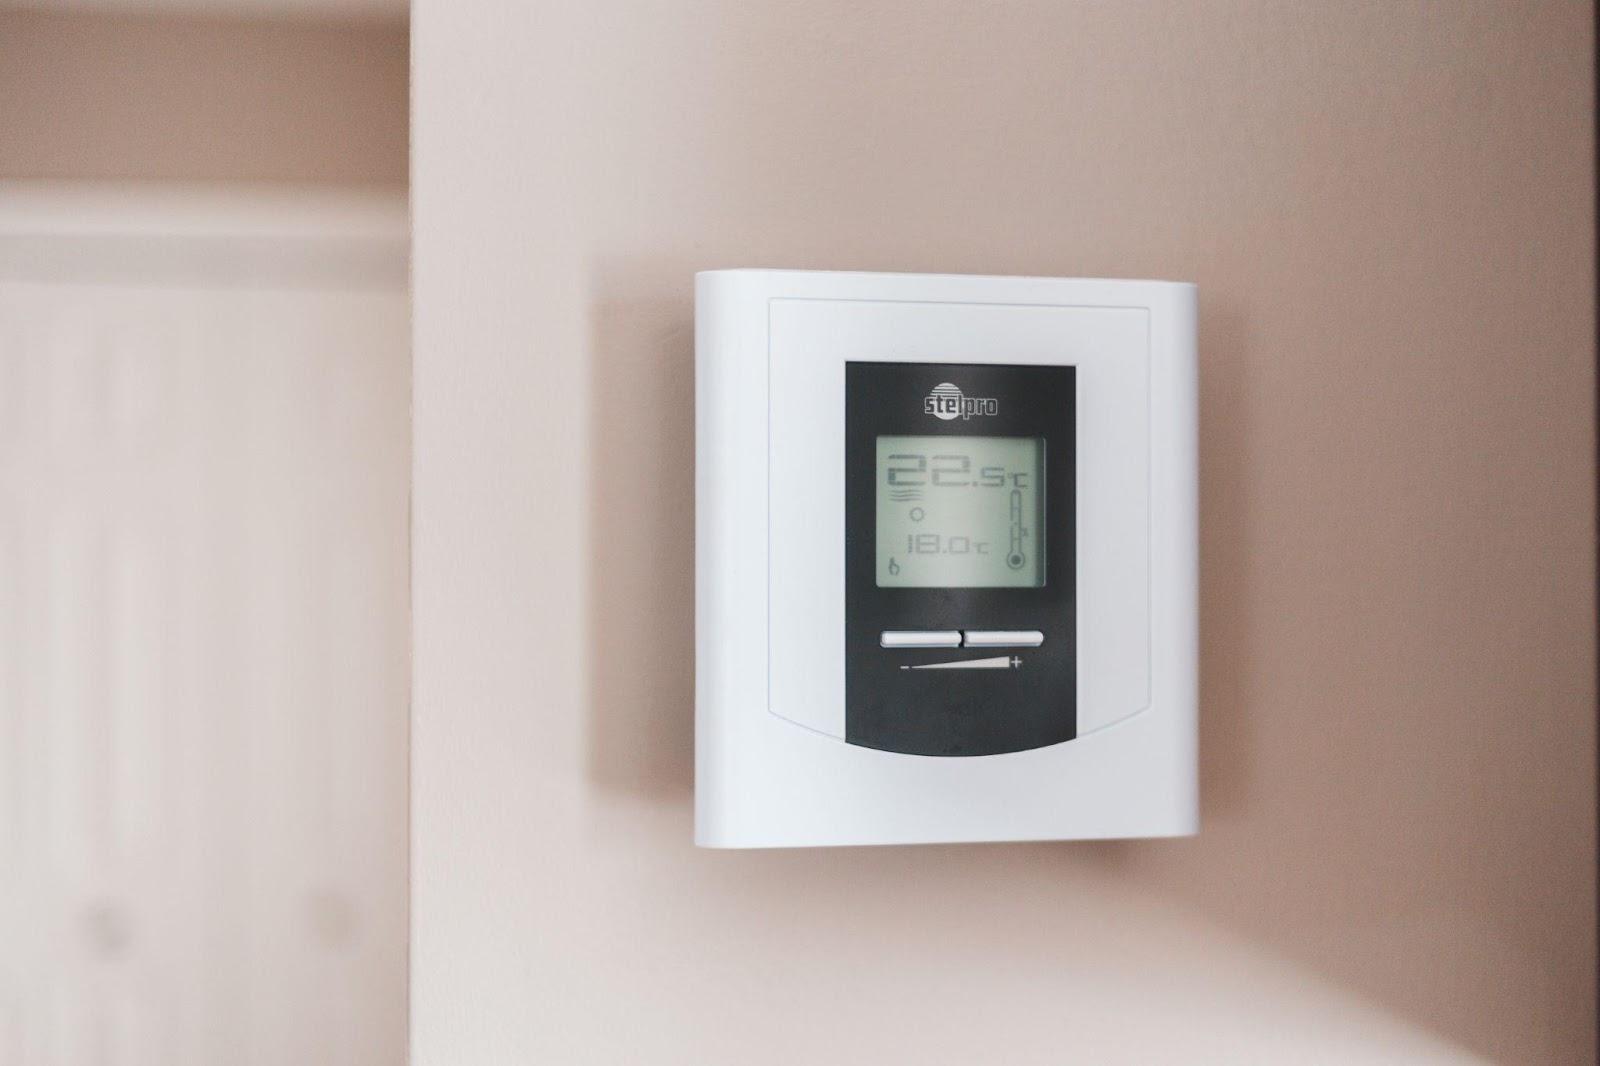 solid-fuel-heating-controls